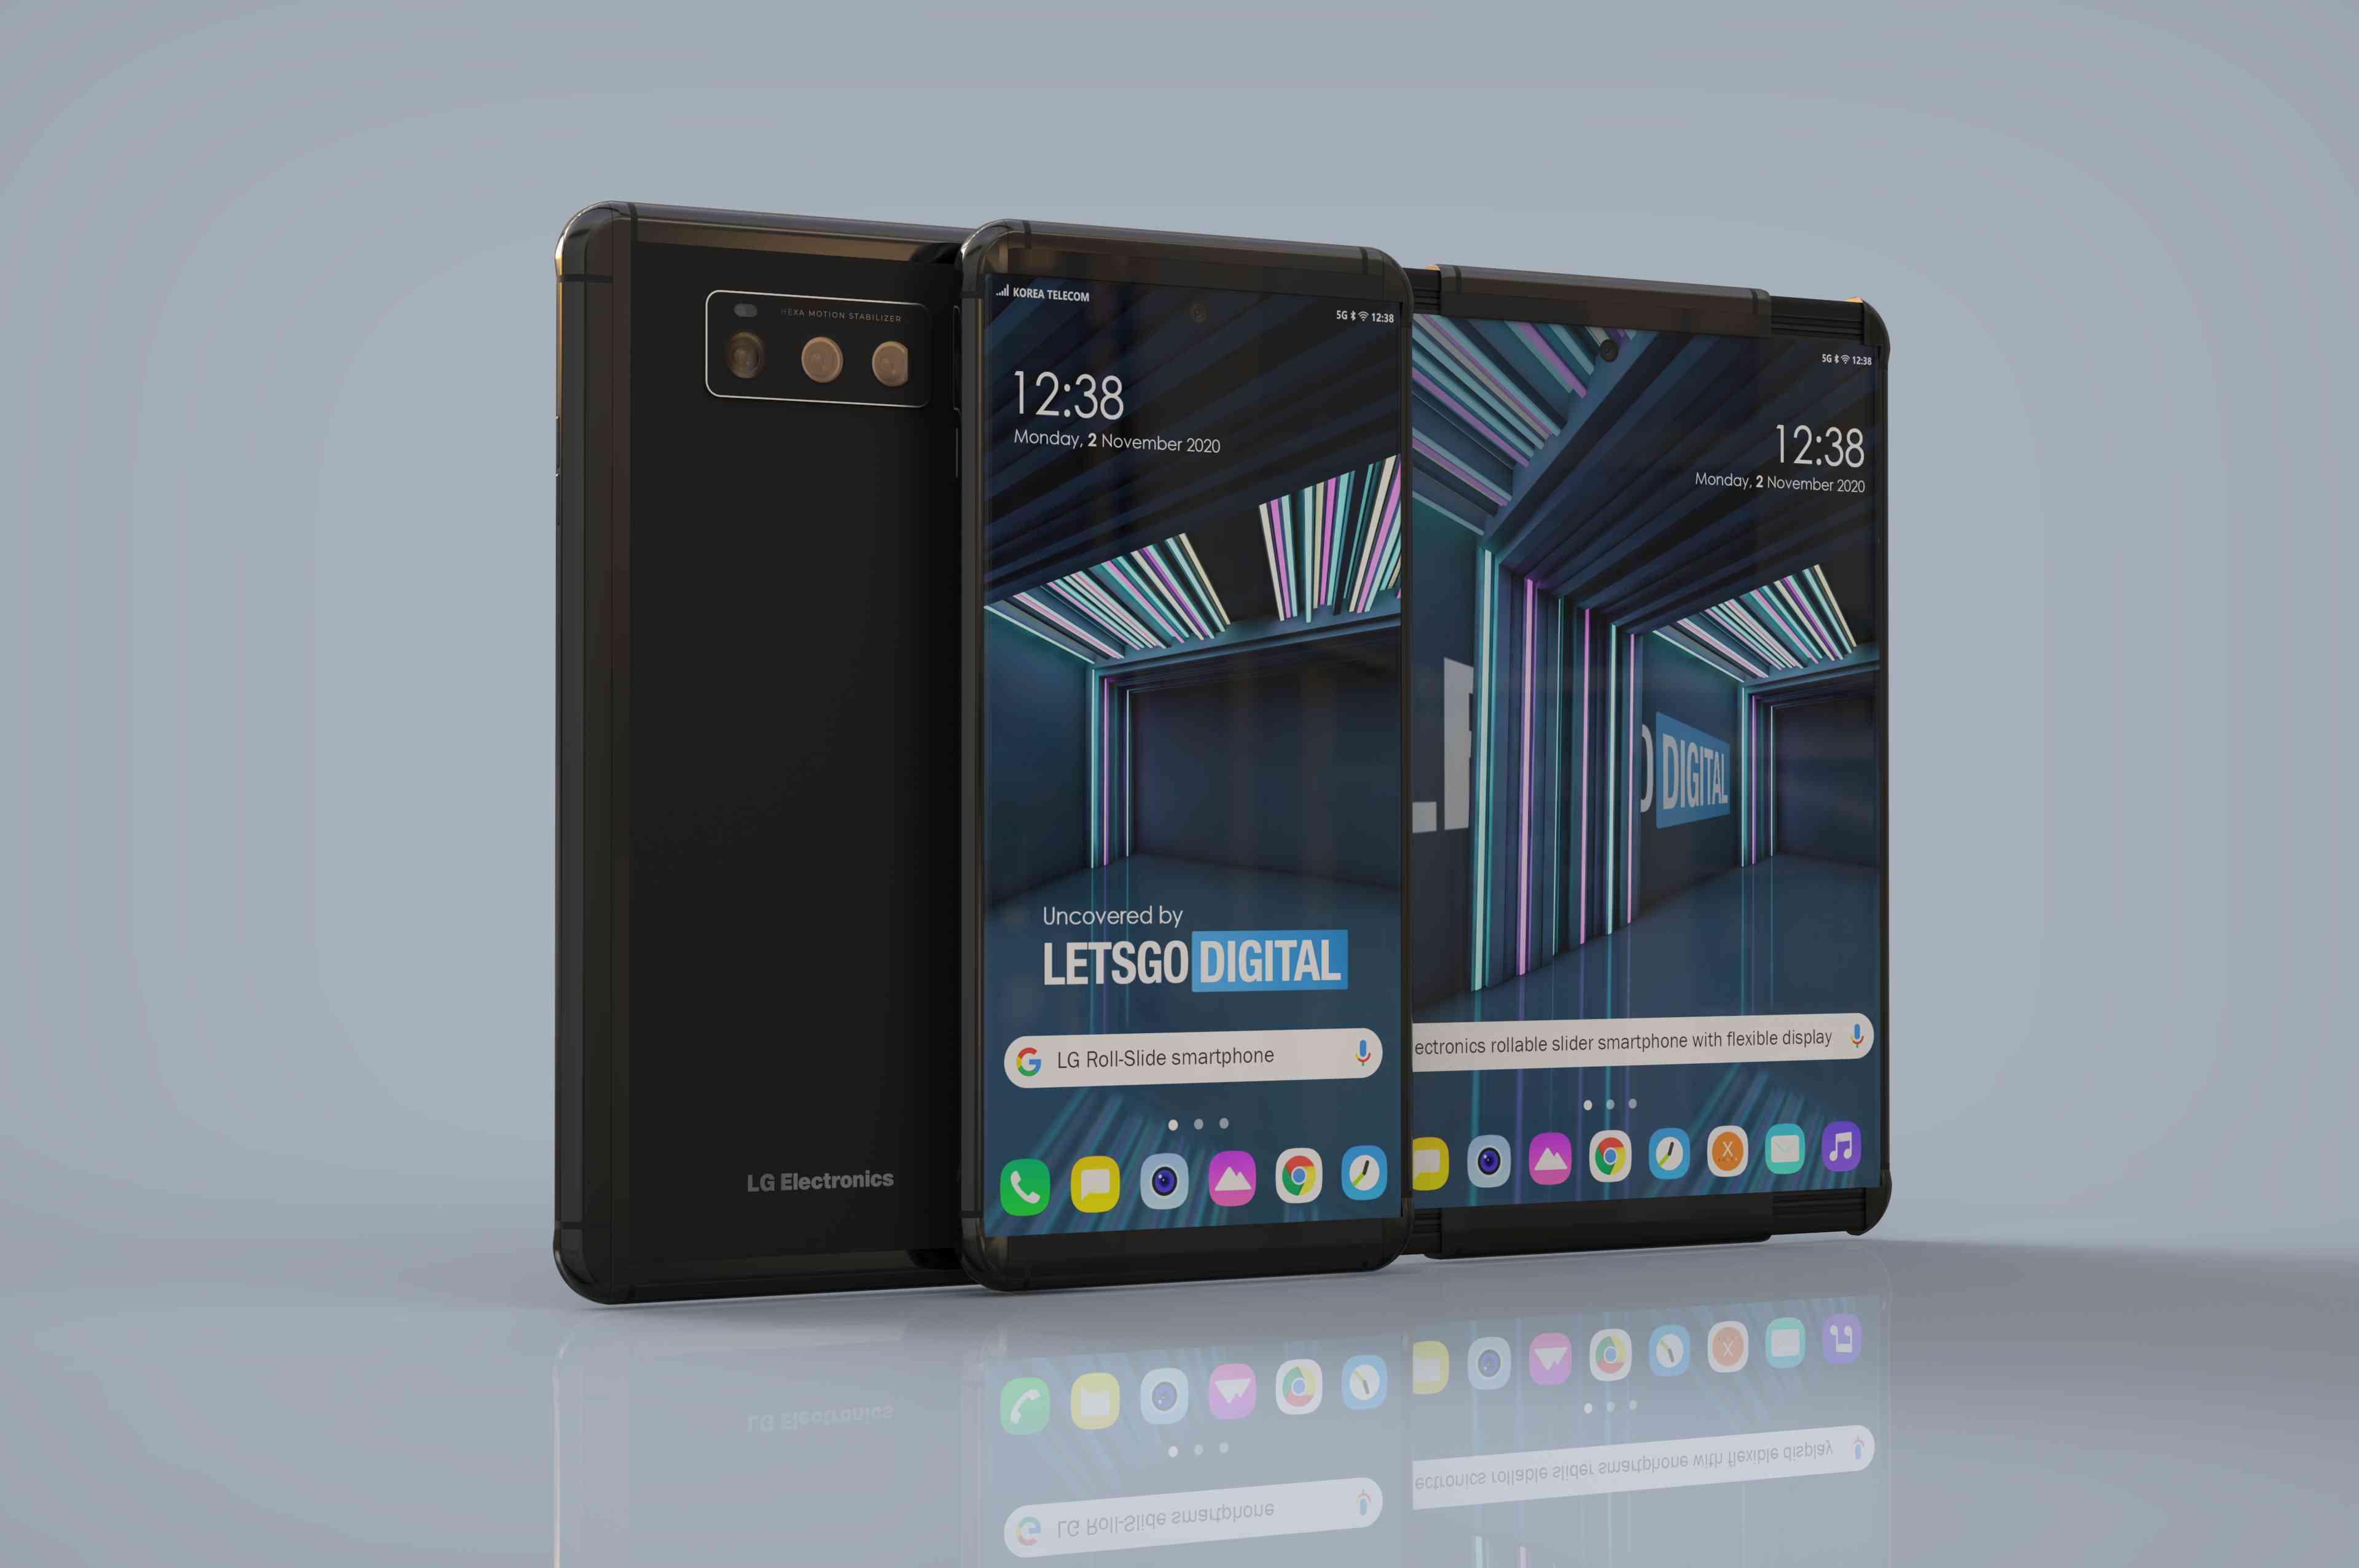 LG Slide Out Phone 3D Rendering